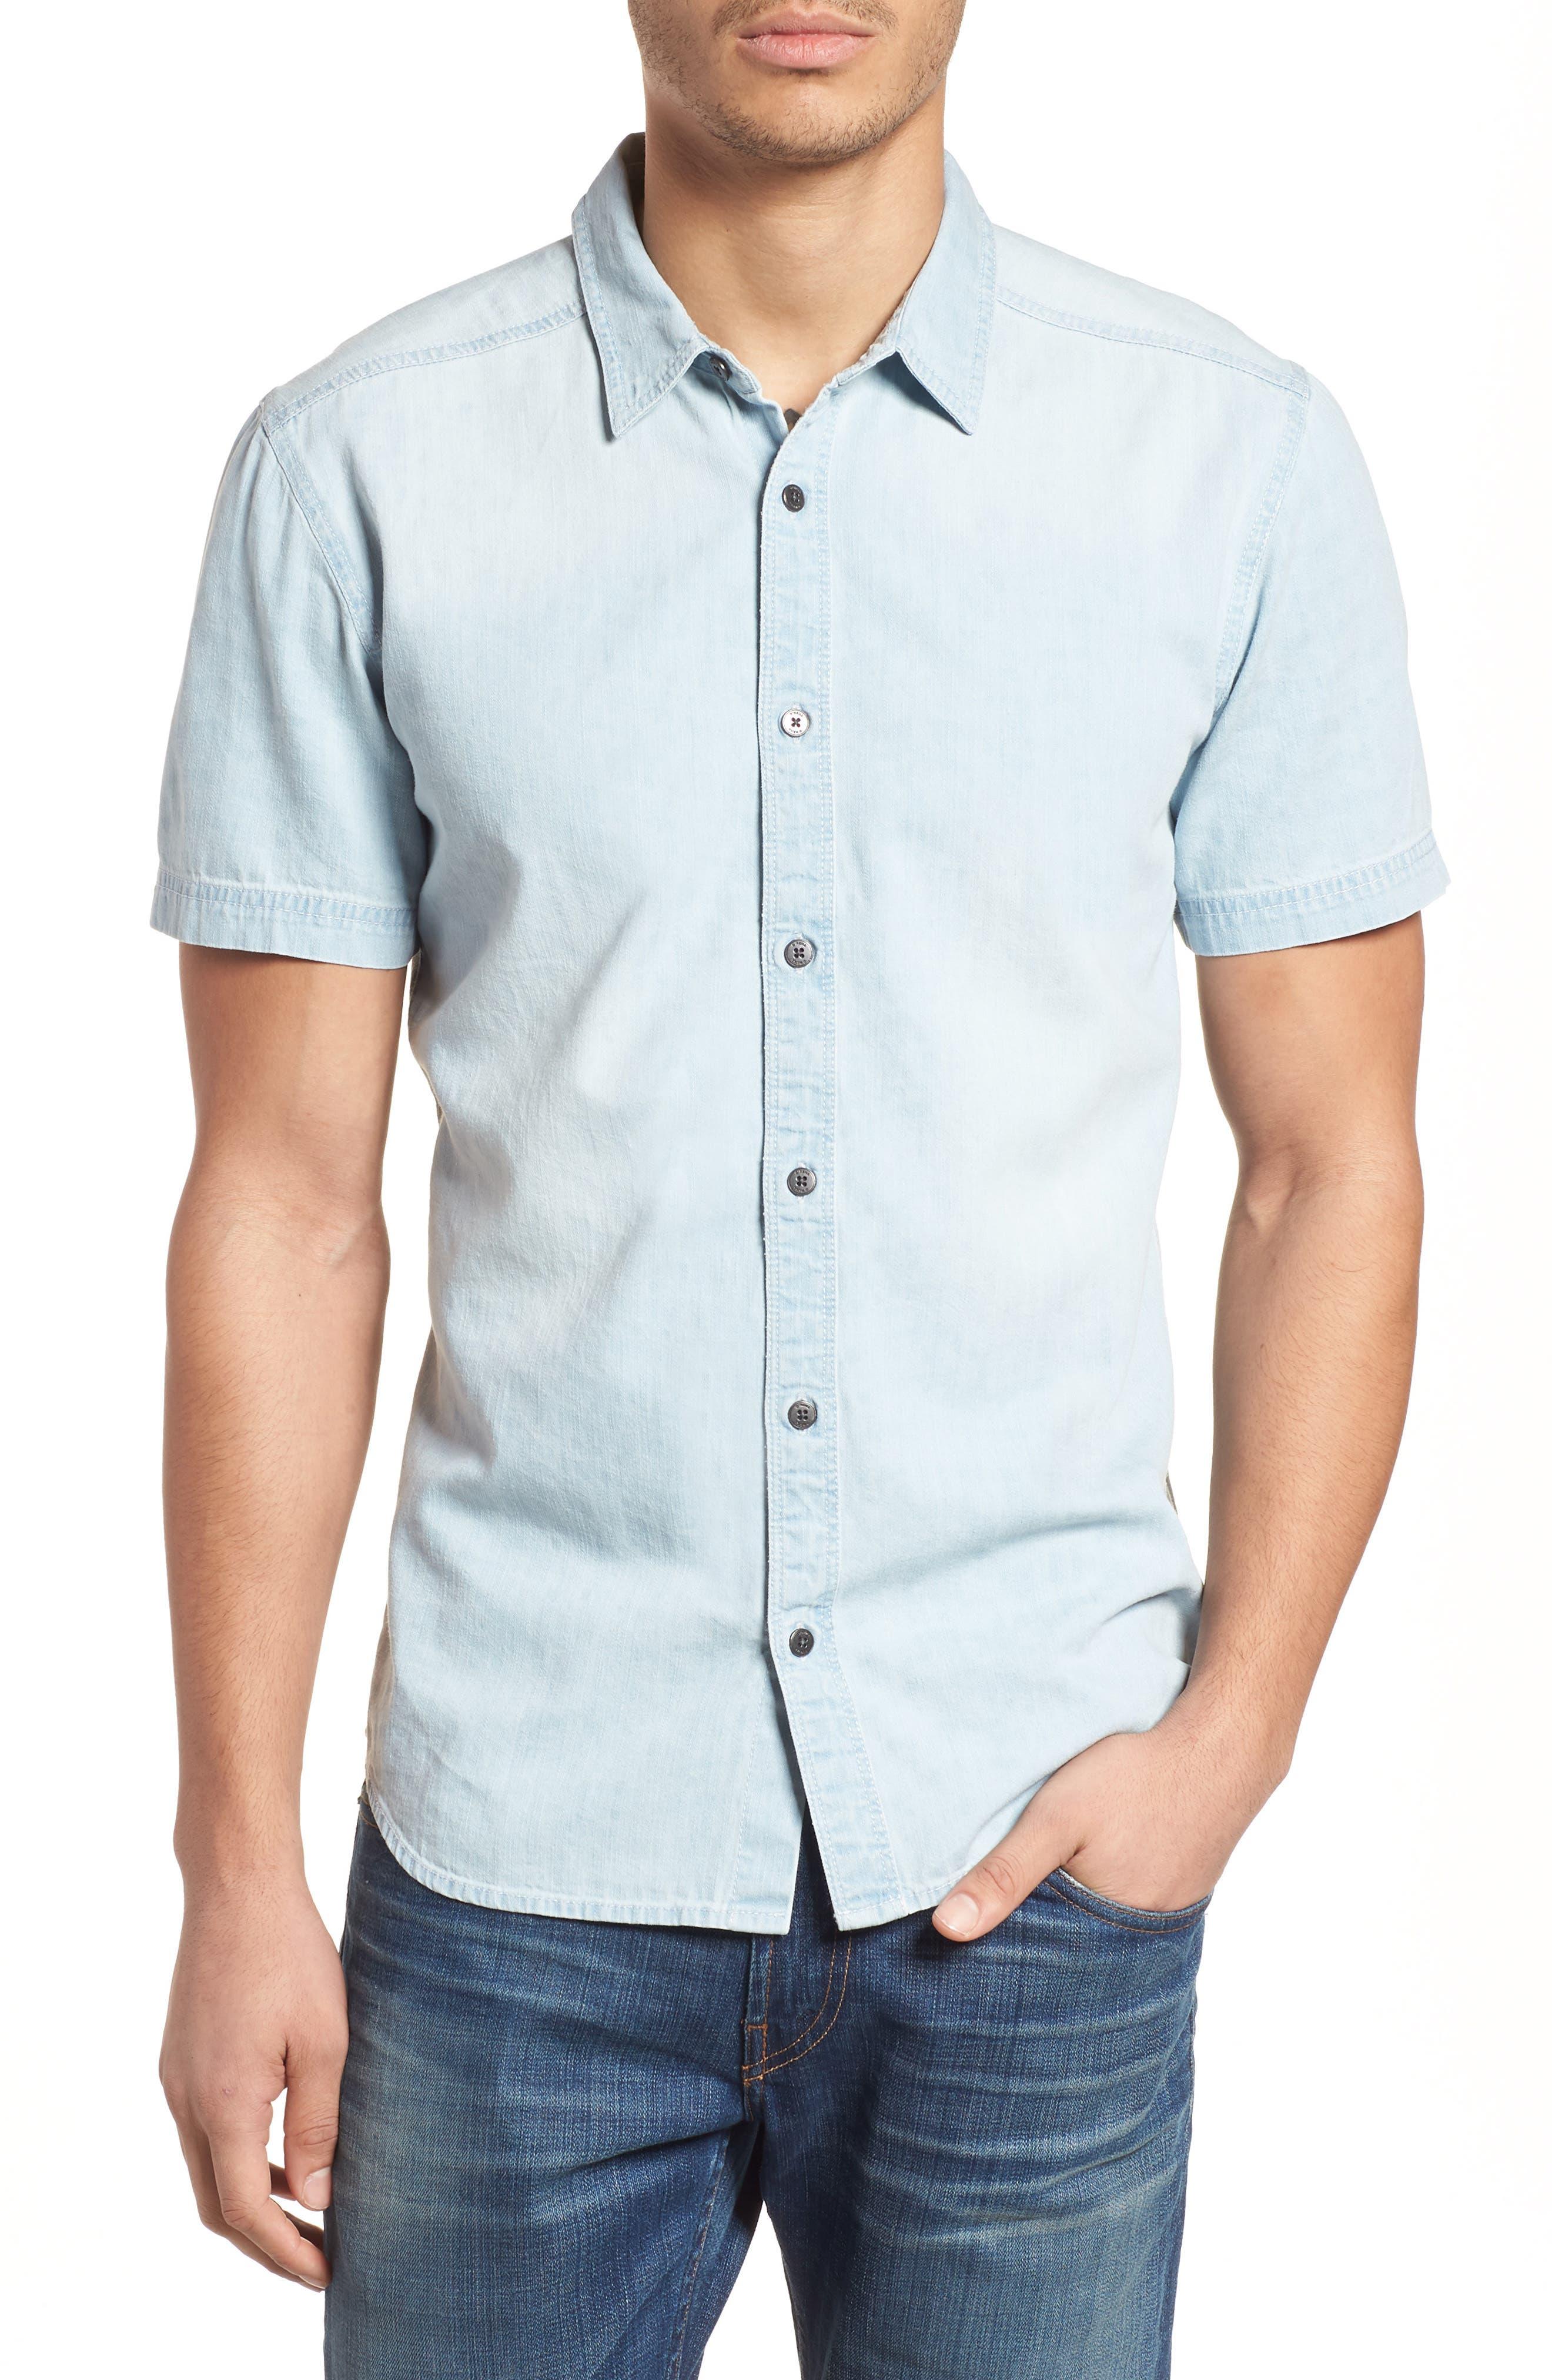 Sabotage Woven Shirt,                         Main,                         color, 020